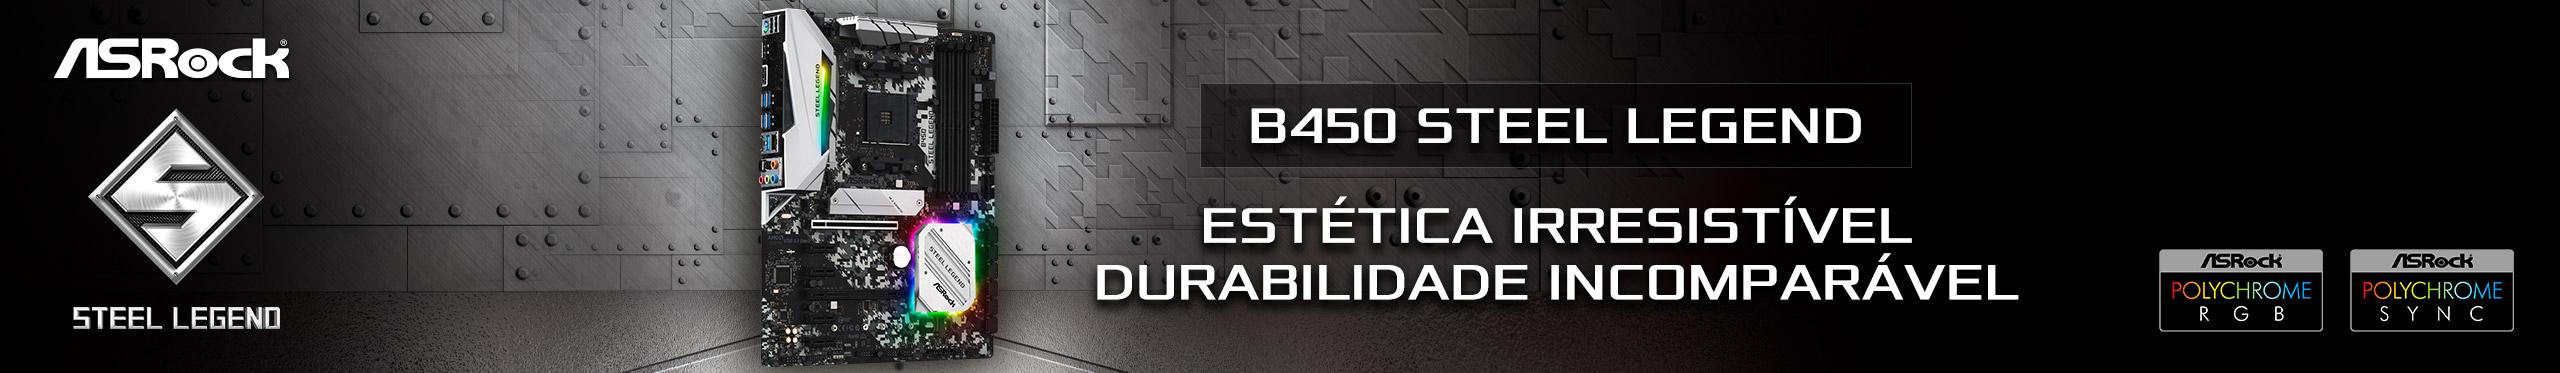 B450 STEEL LEGEND - CONFIRA!